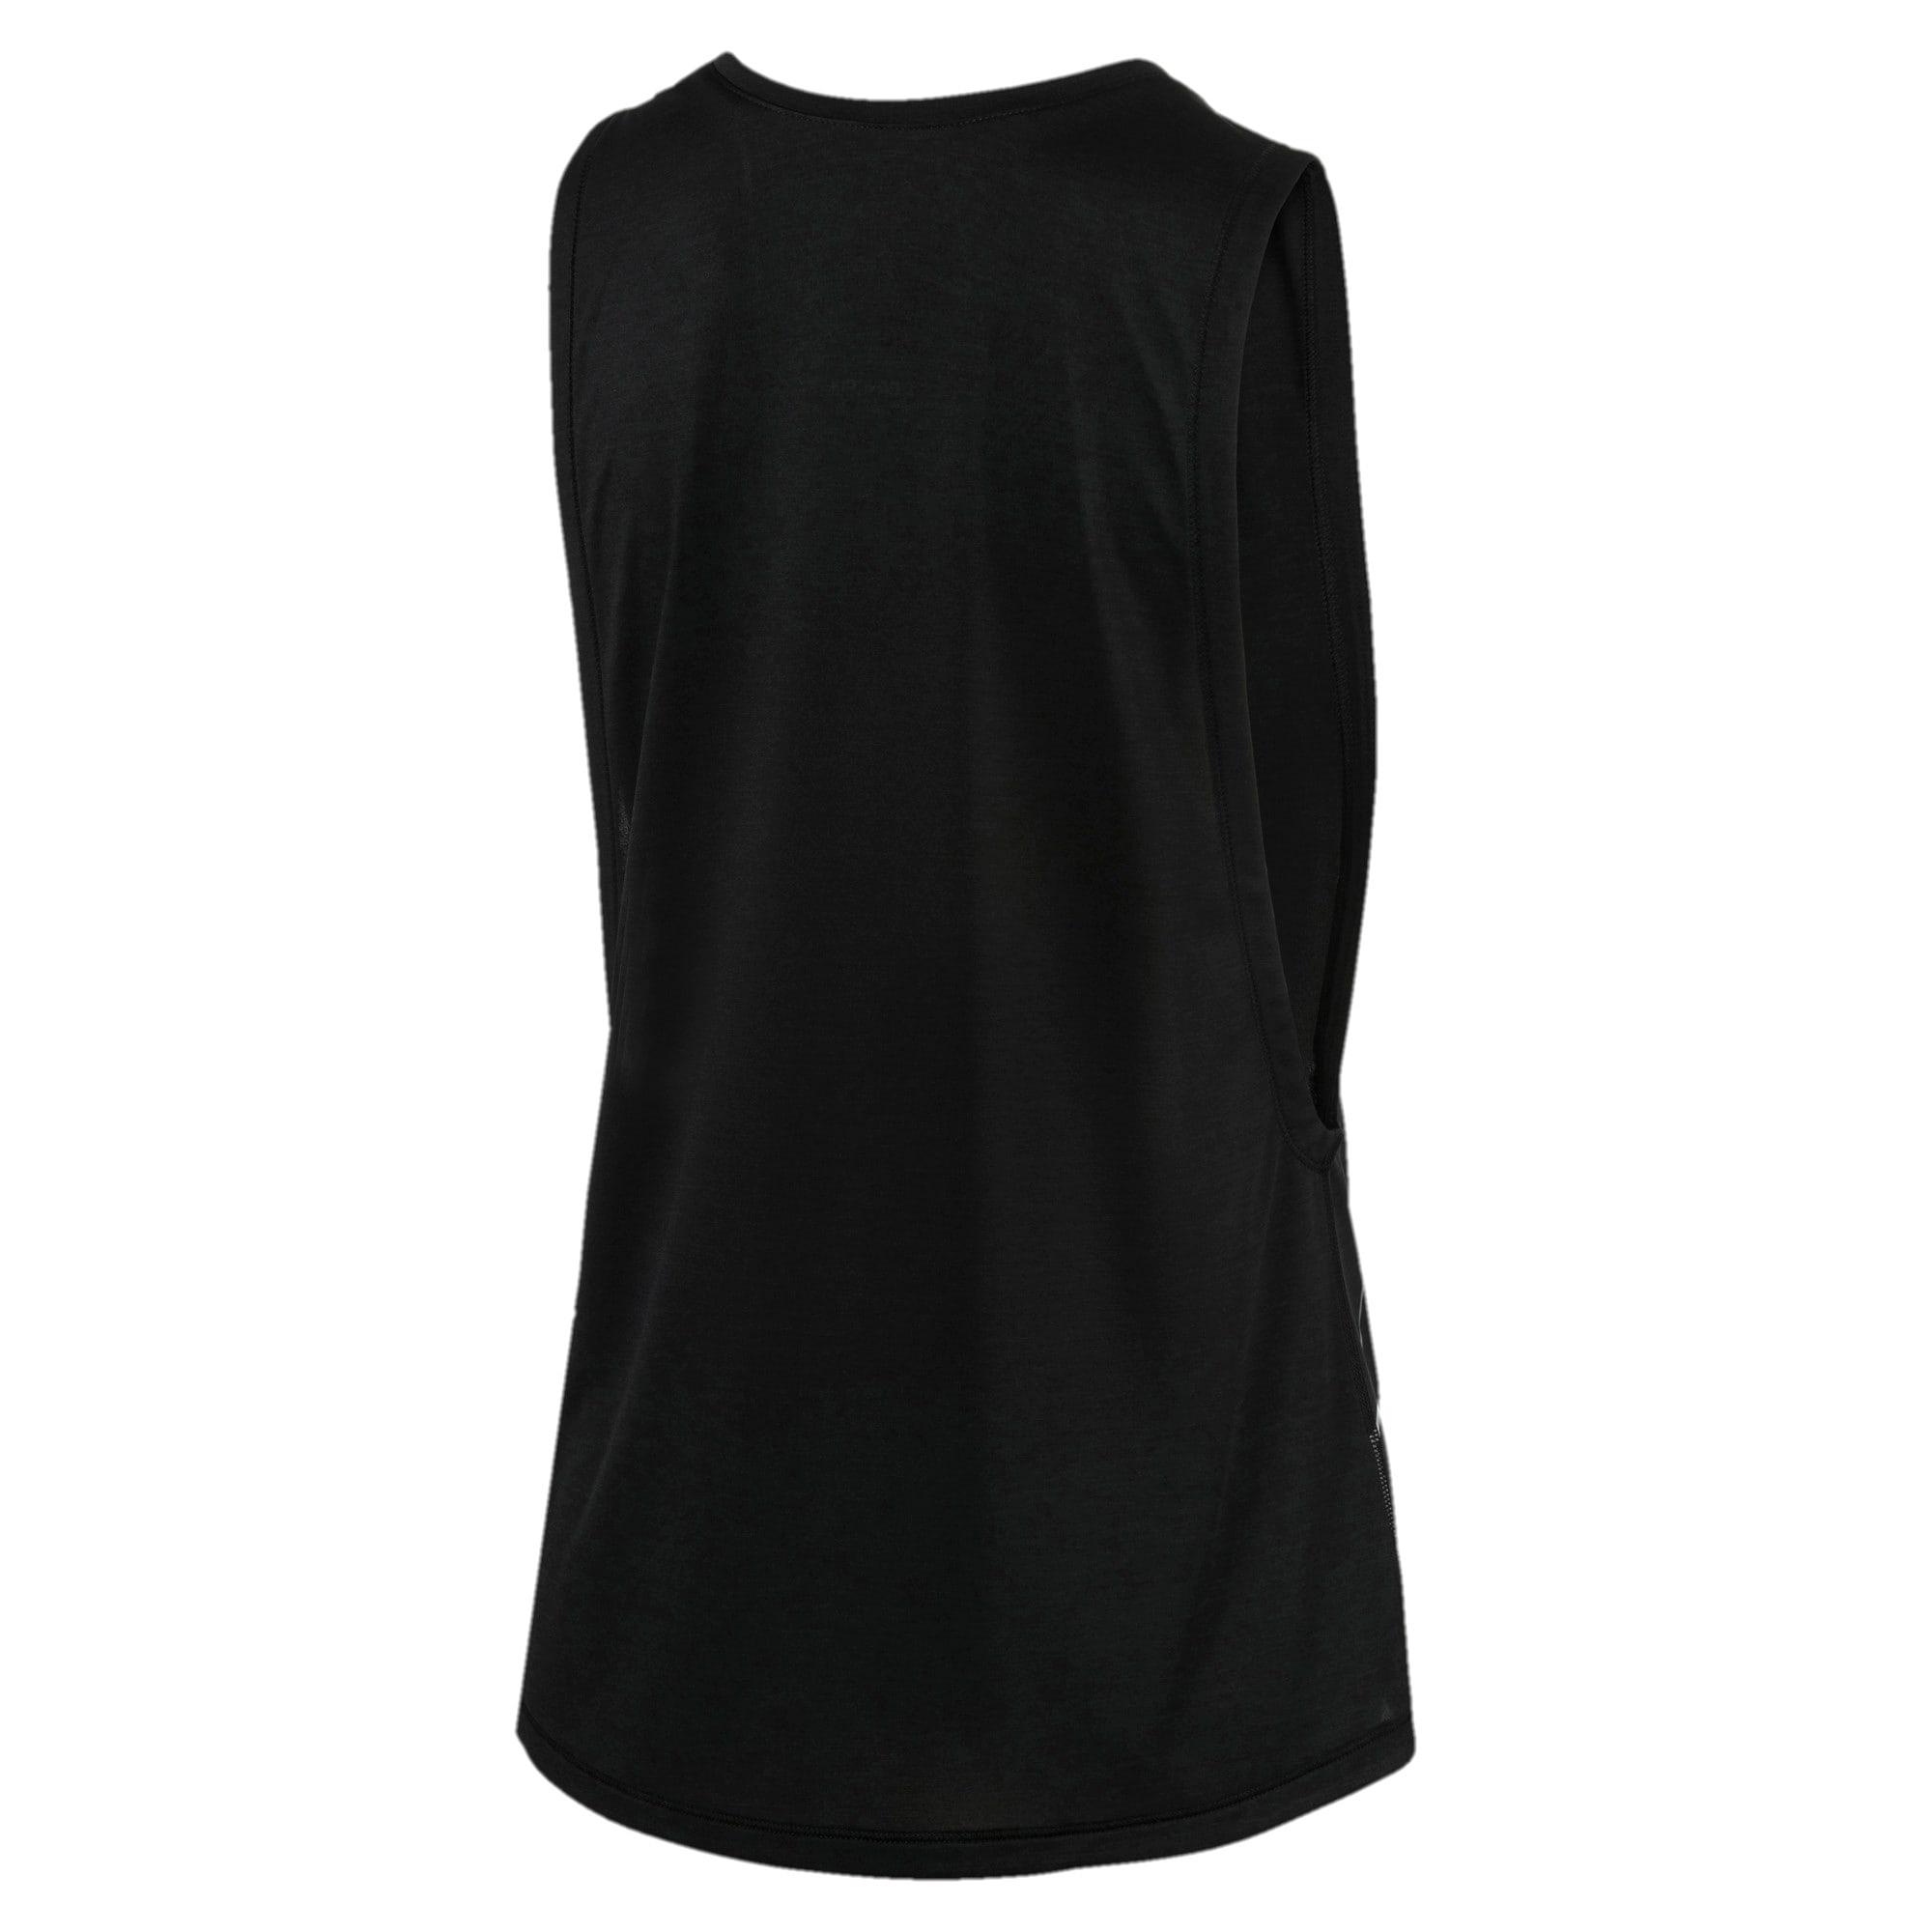 Miniatura 5 de Camiseta sin mangas Aire de mujer, Puma Black Heather, mediano